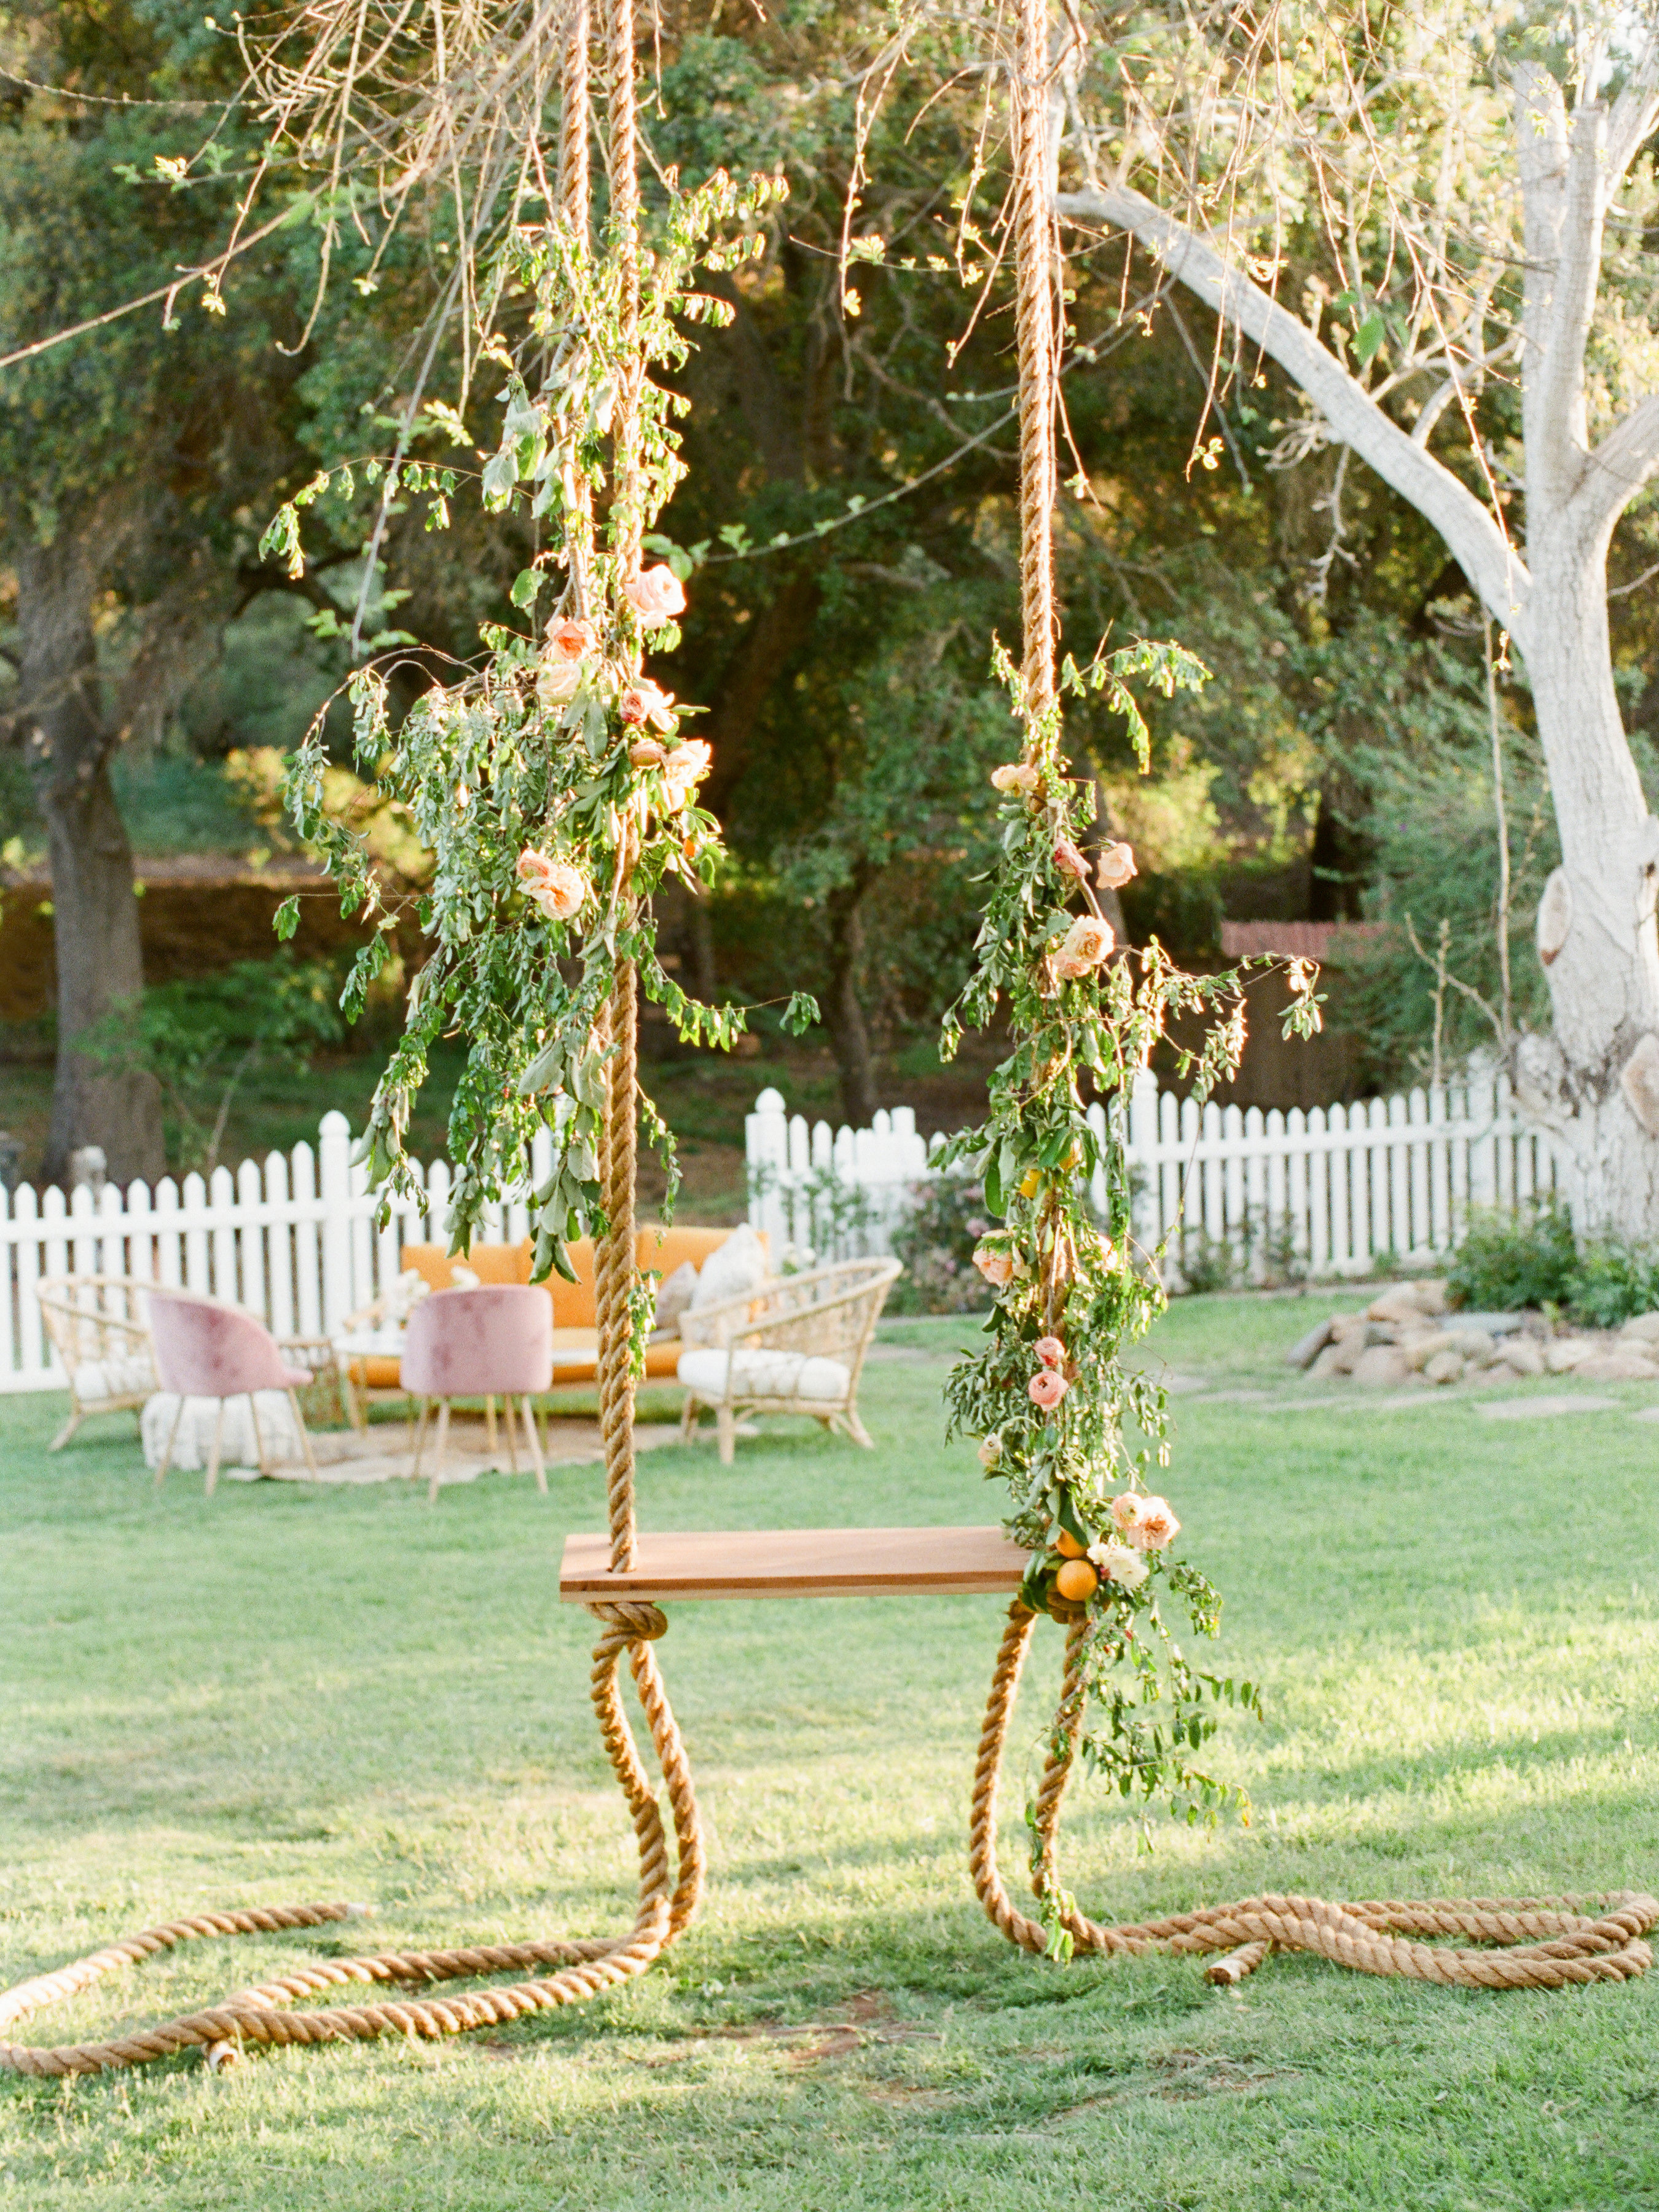 Tenley molzahn taylor leopold wedding swing greenery